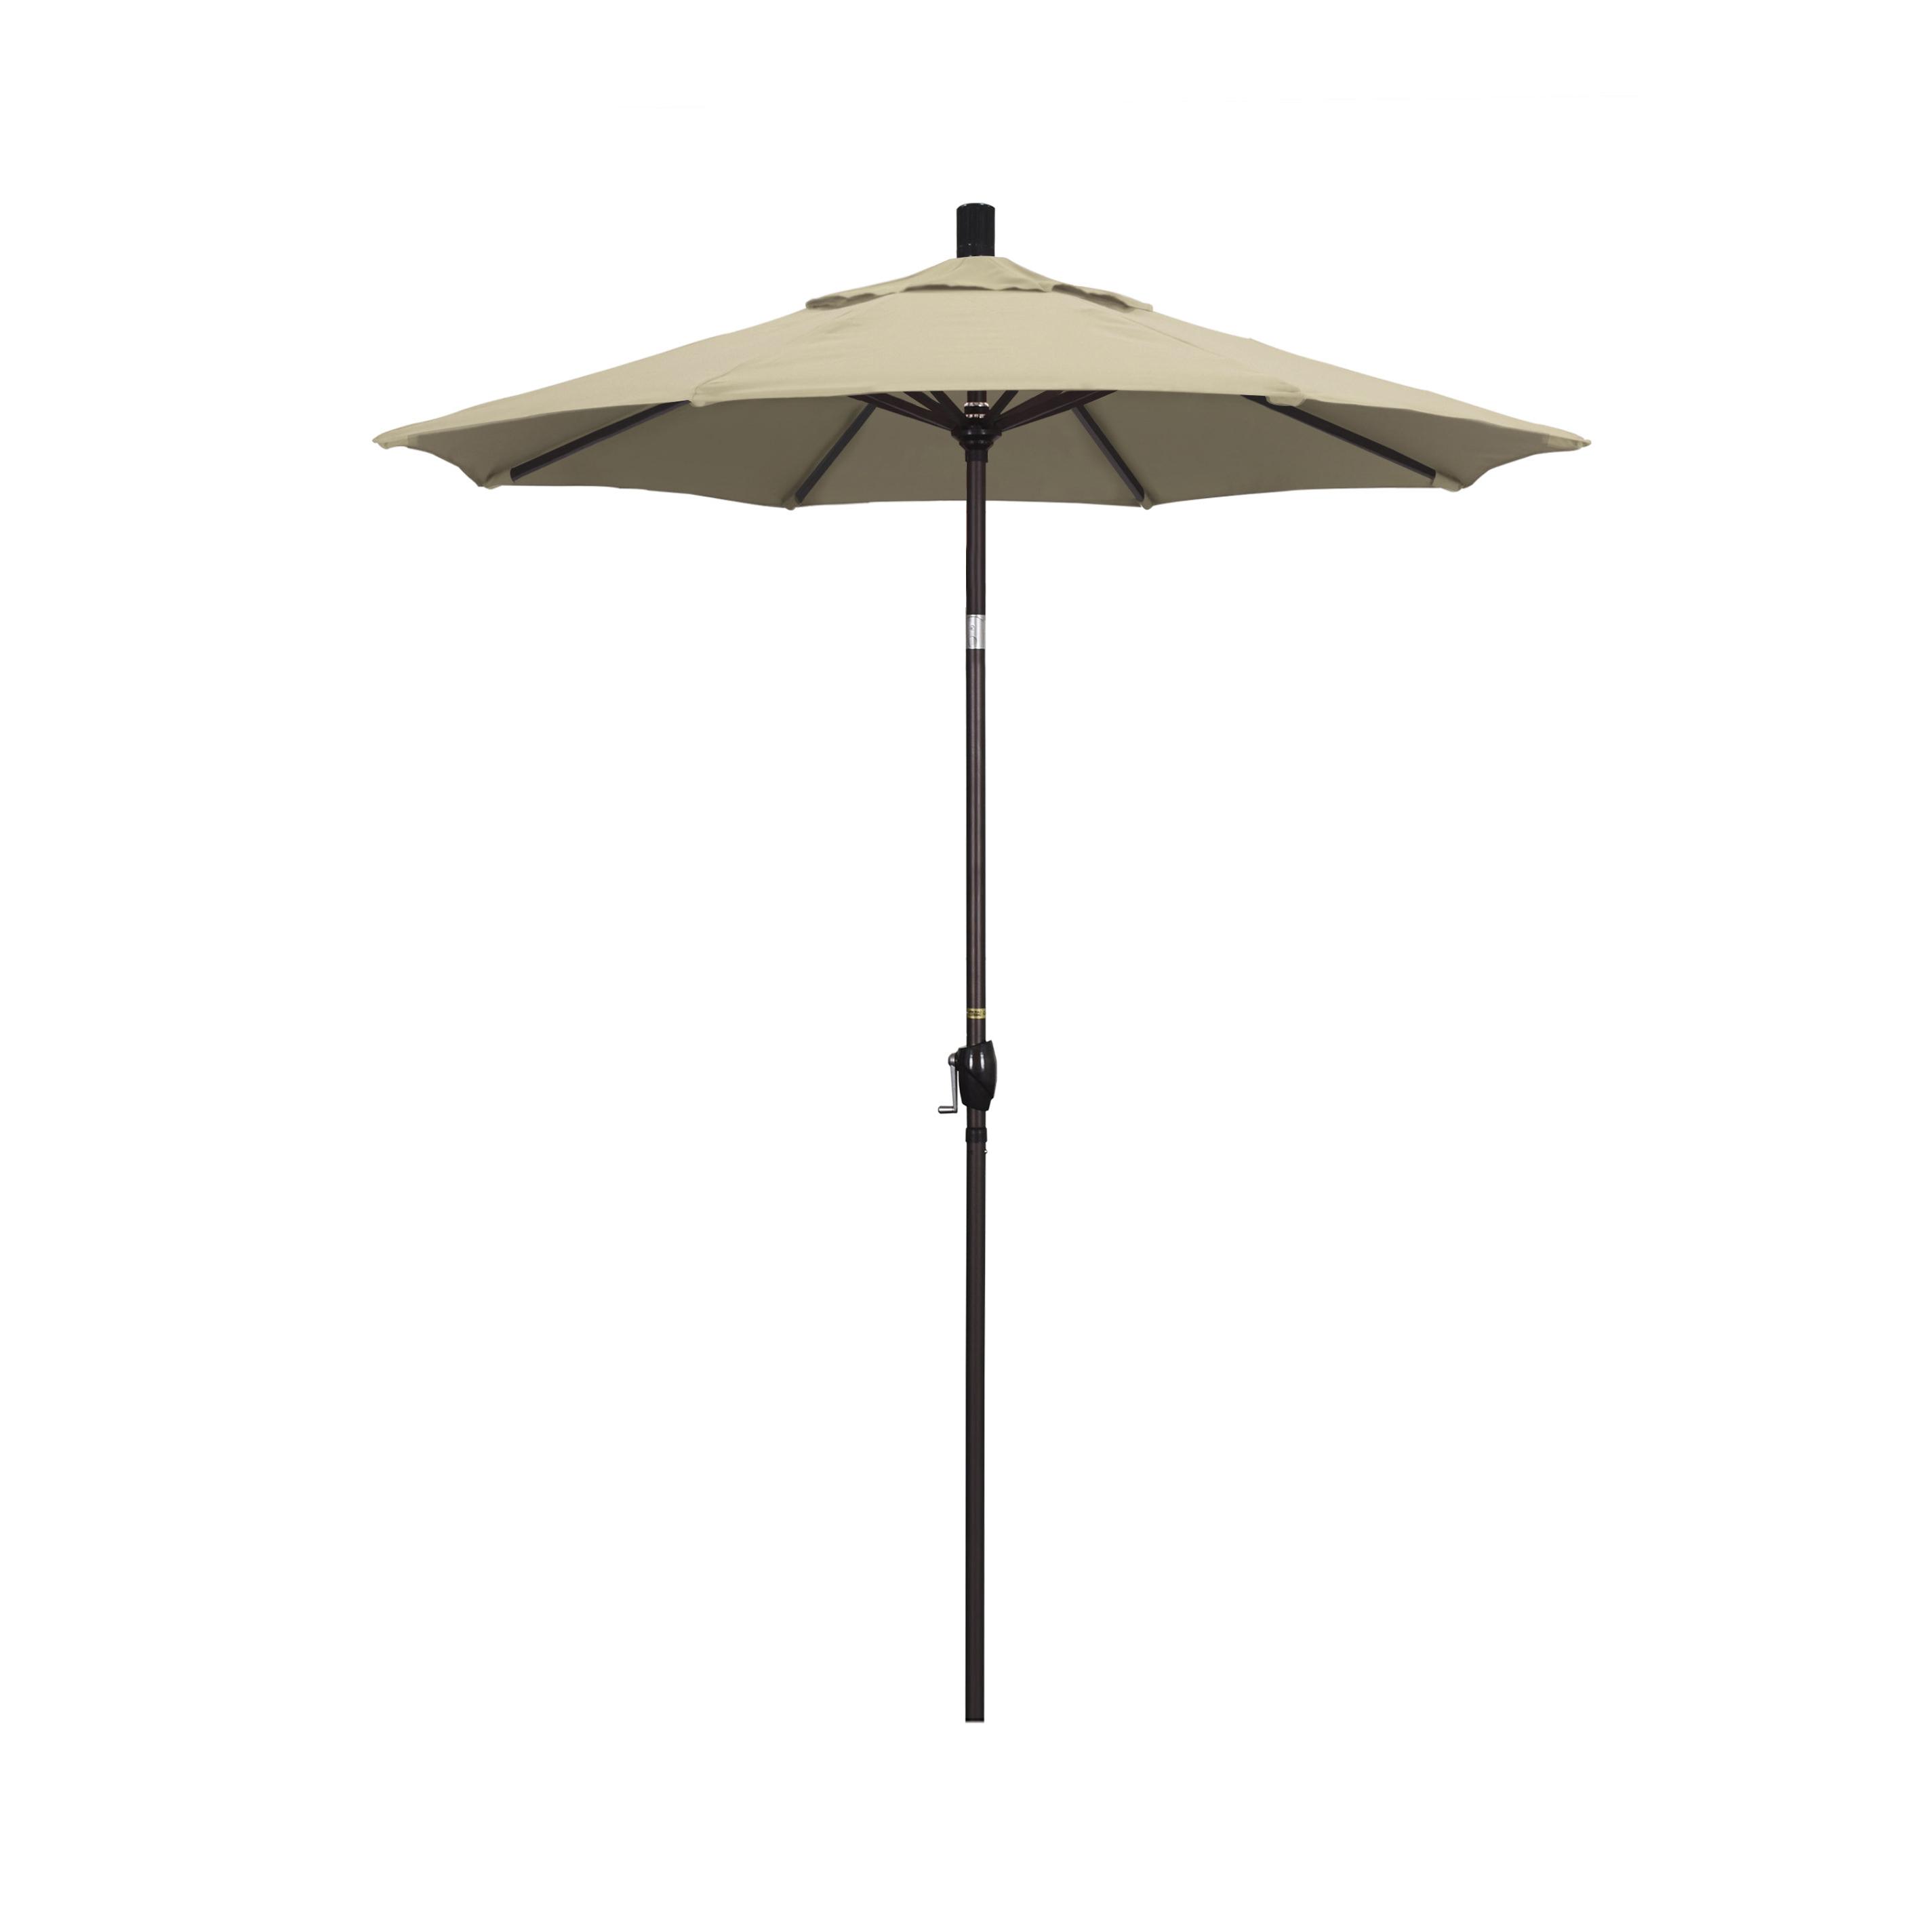 Widely Used Muldoon Market Umbrellas Pertaining To Wallach 6' Market Sunbrella Umbrella (View 20 of 20)